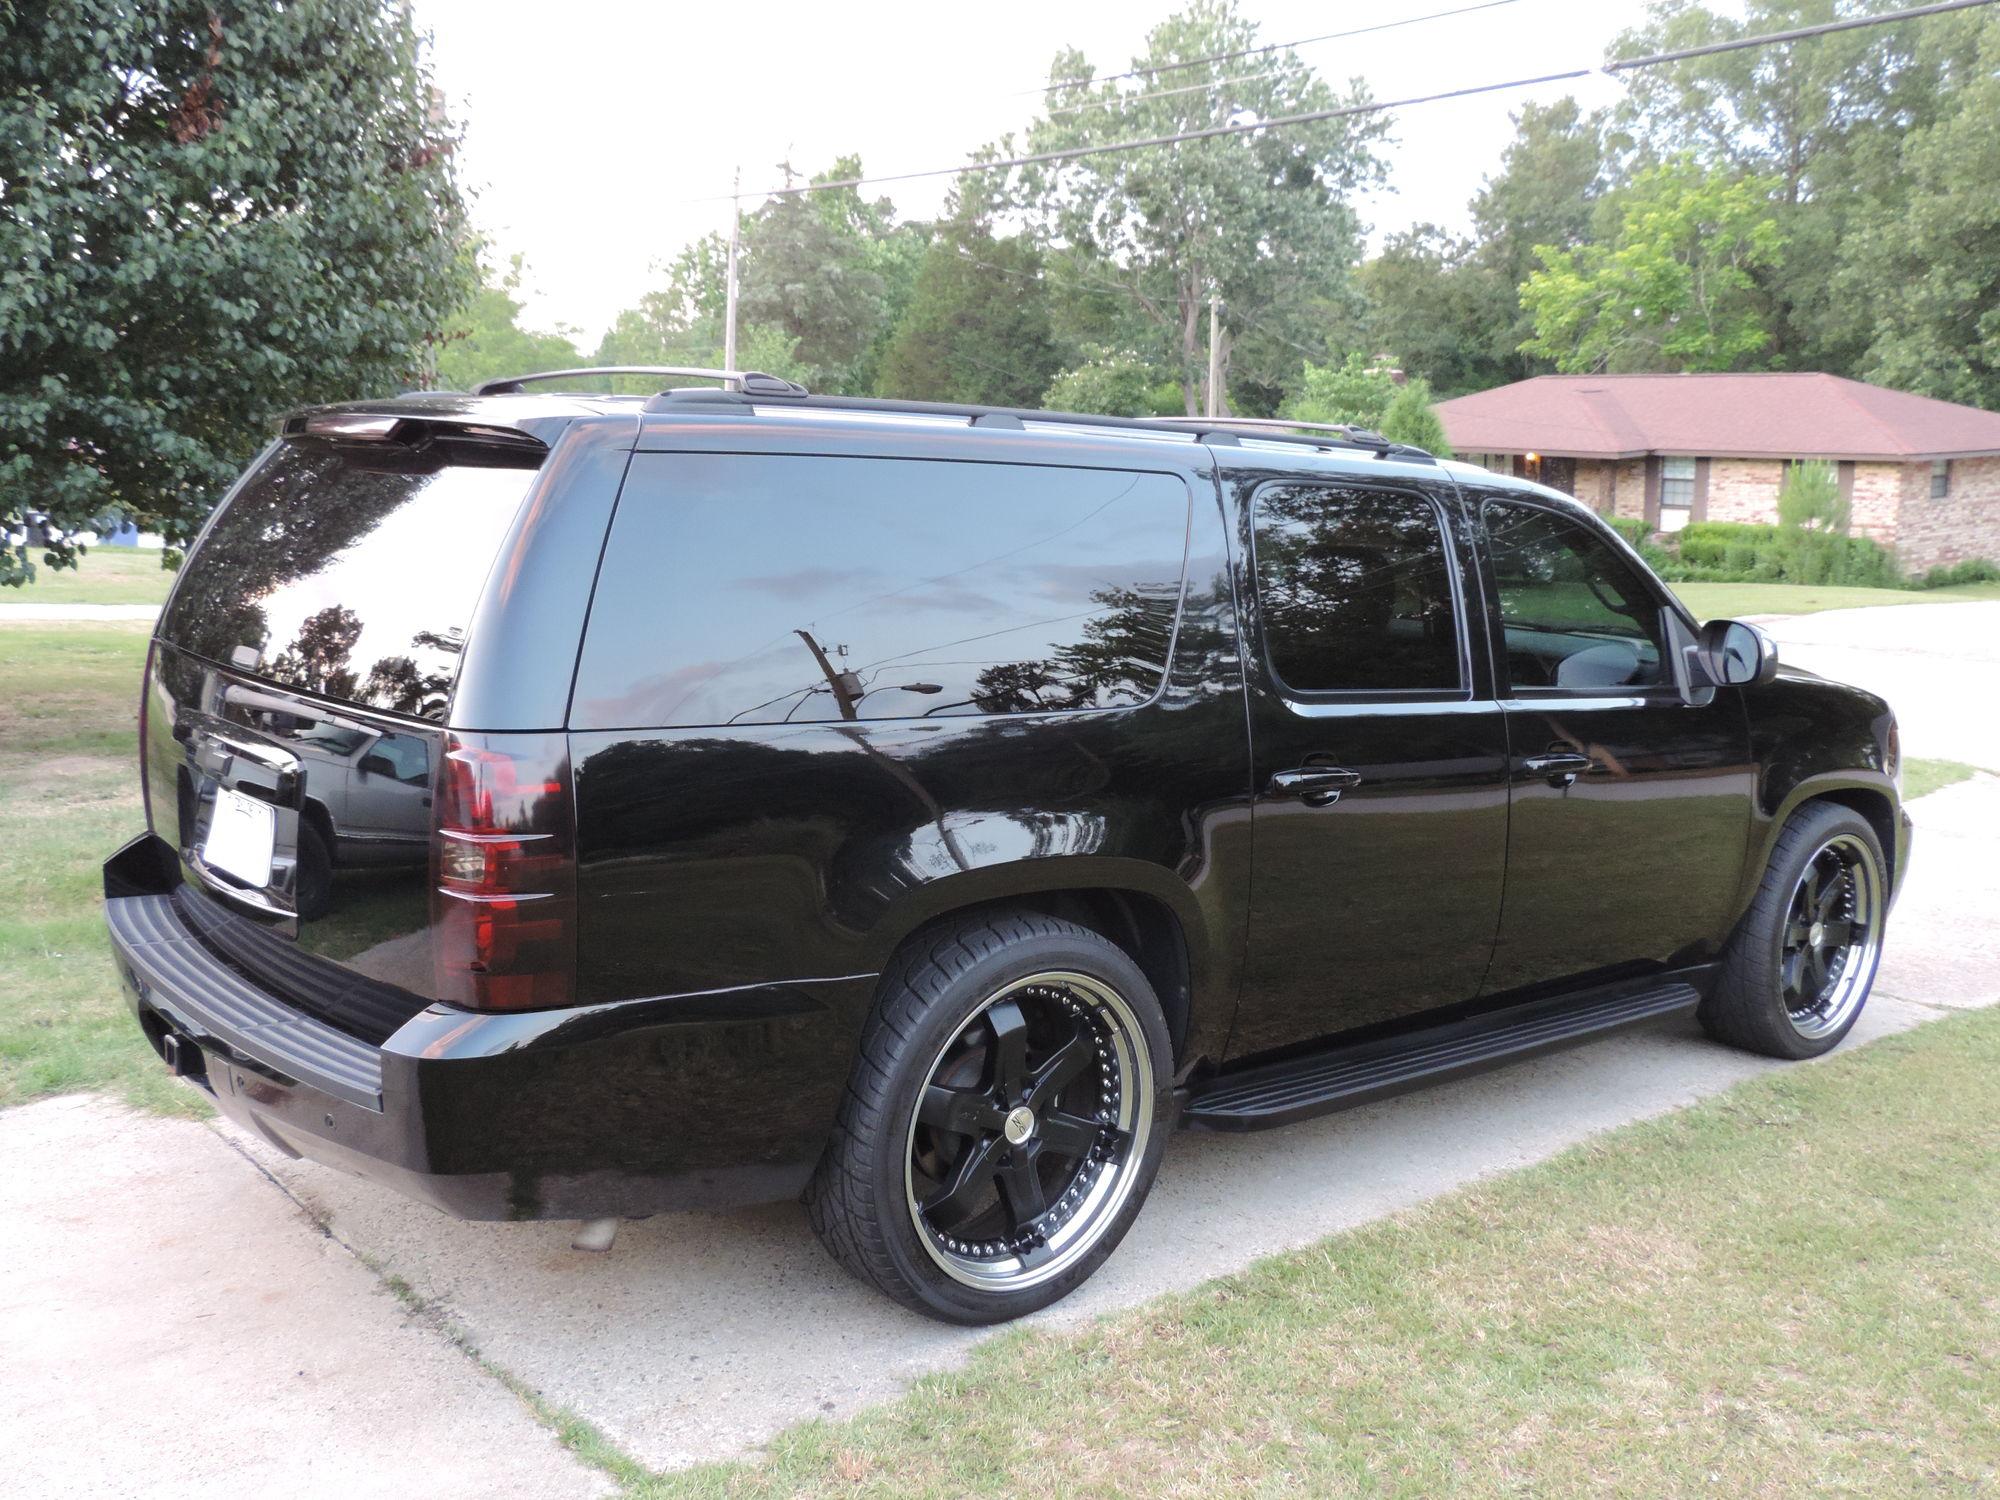 2007 Chevrolet Tahoe Ltz >> Blacked out 2008 Suburban LTZ - Chevrolet Forum - Chevy Enthusiasts Forums